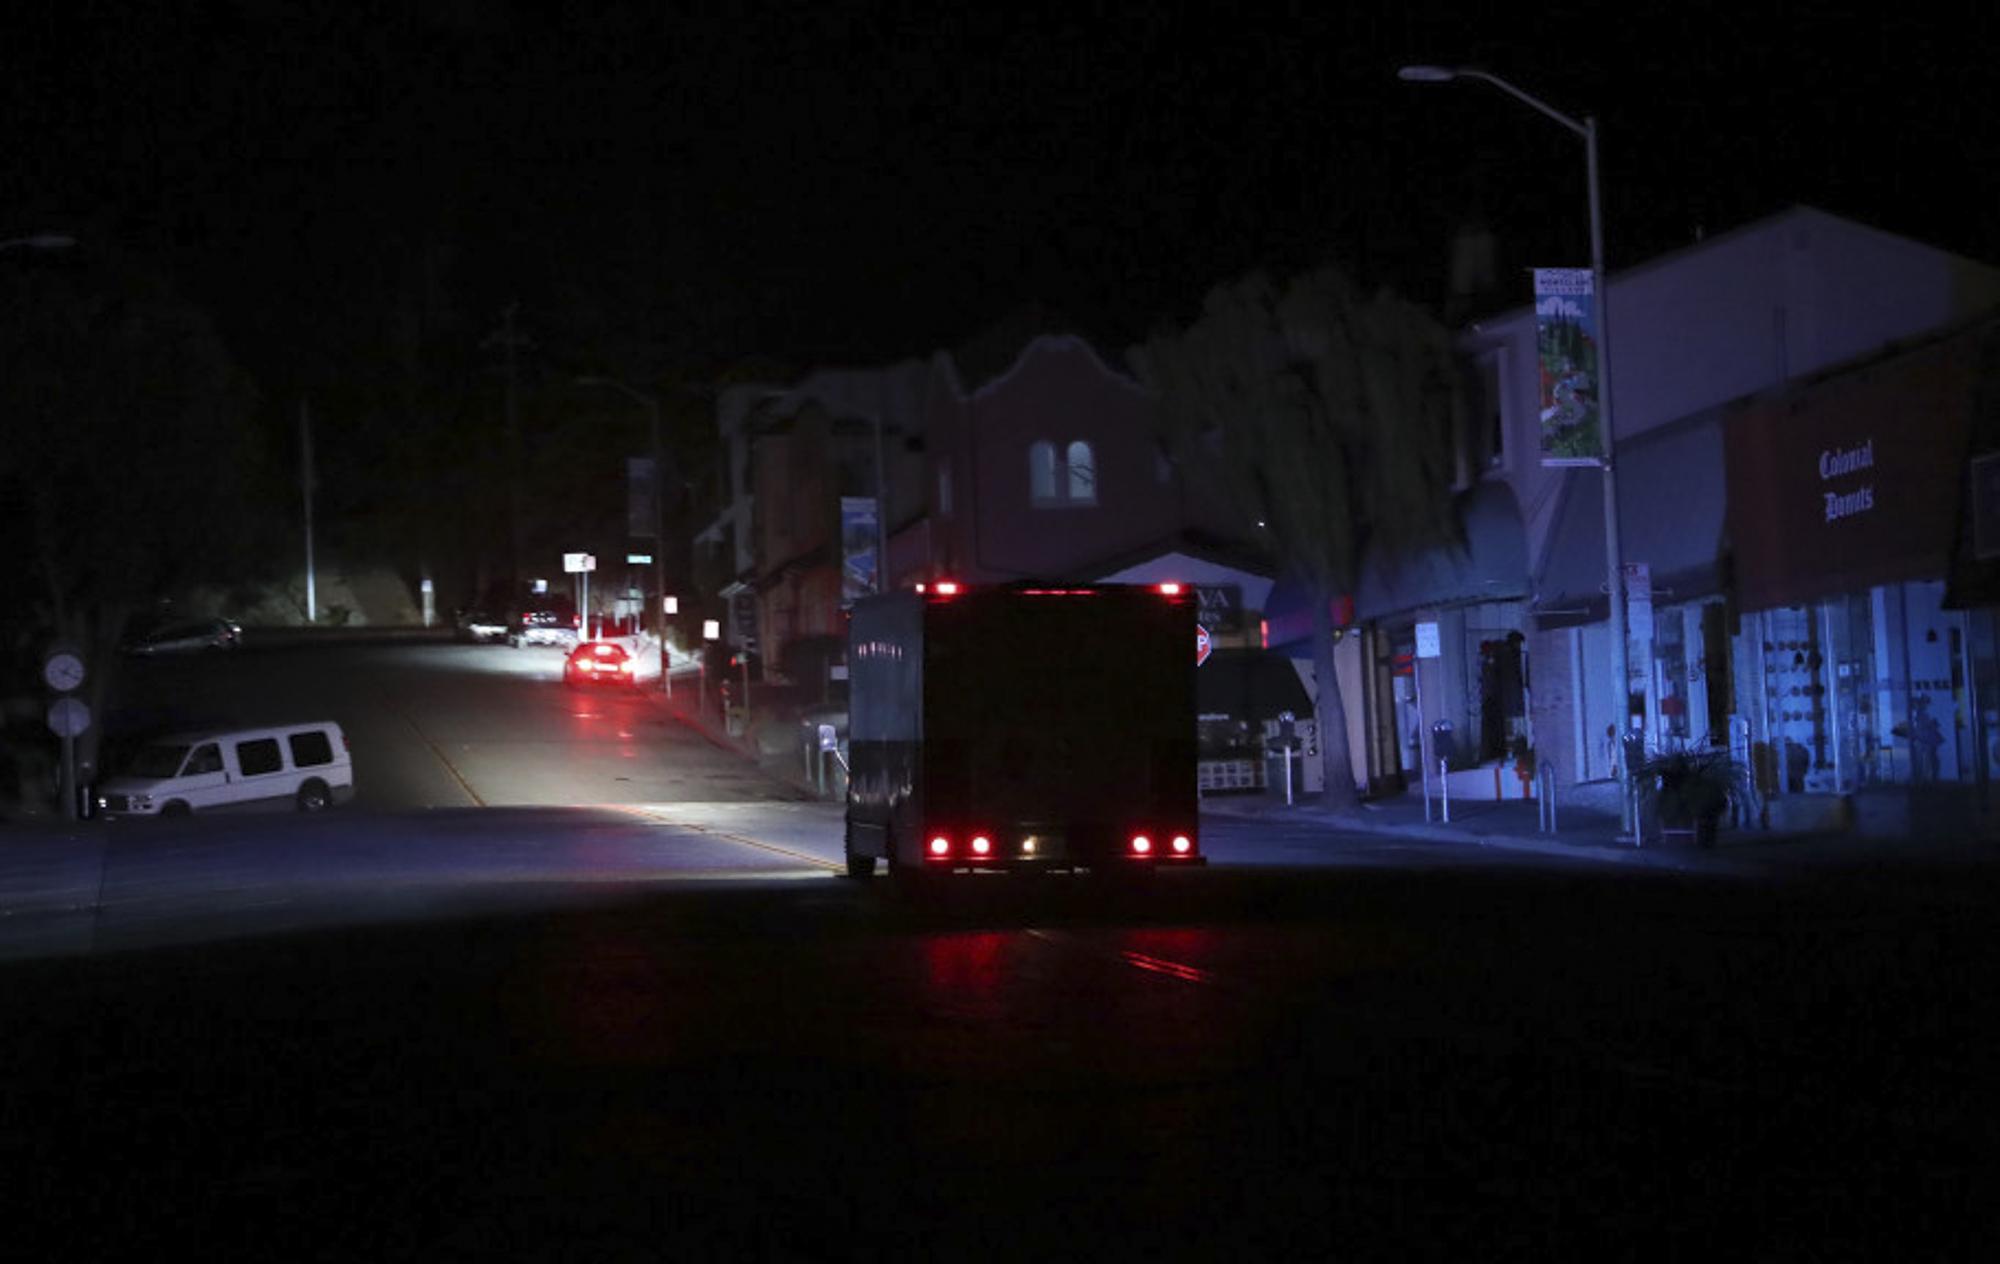 A police vehicle patrols a dark street after PG&E shut off power in Oakland, California, last year. Photo by Jane Tyska, Bay Area News Group